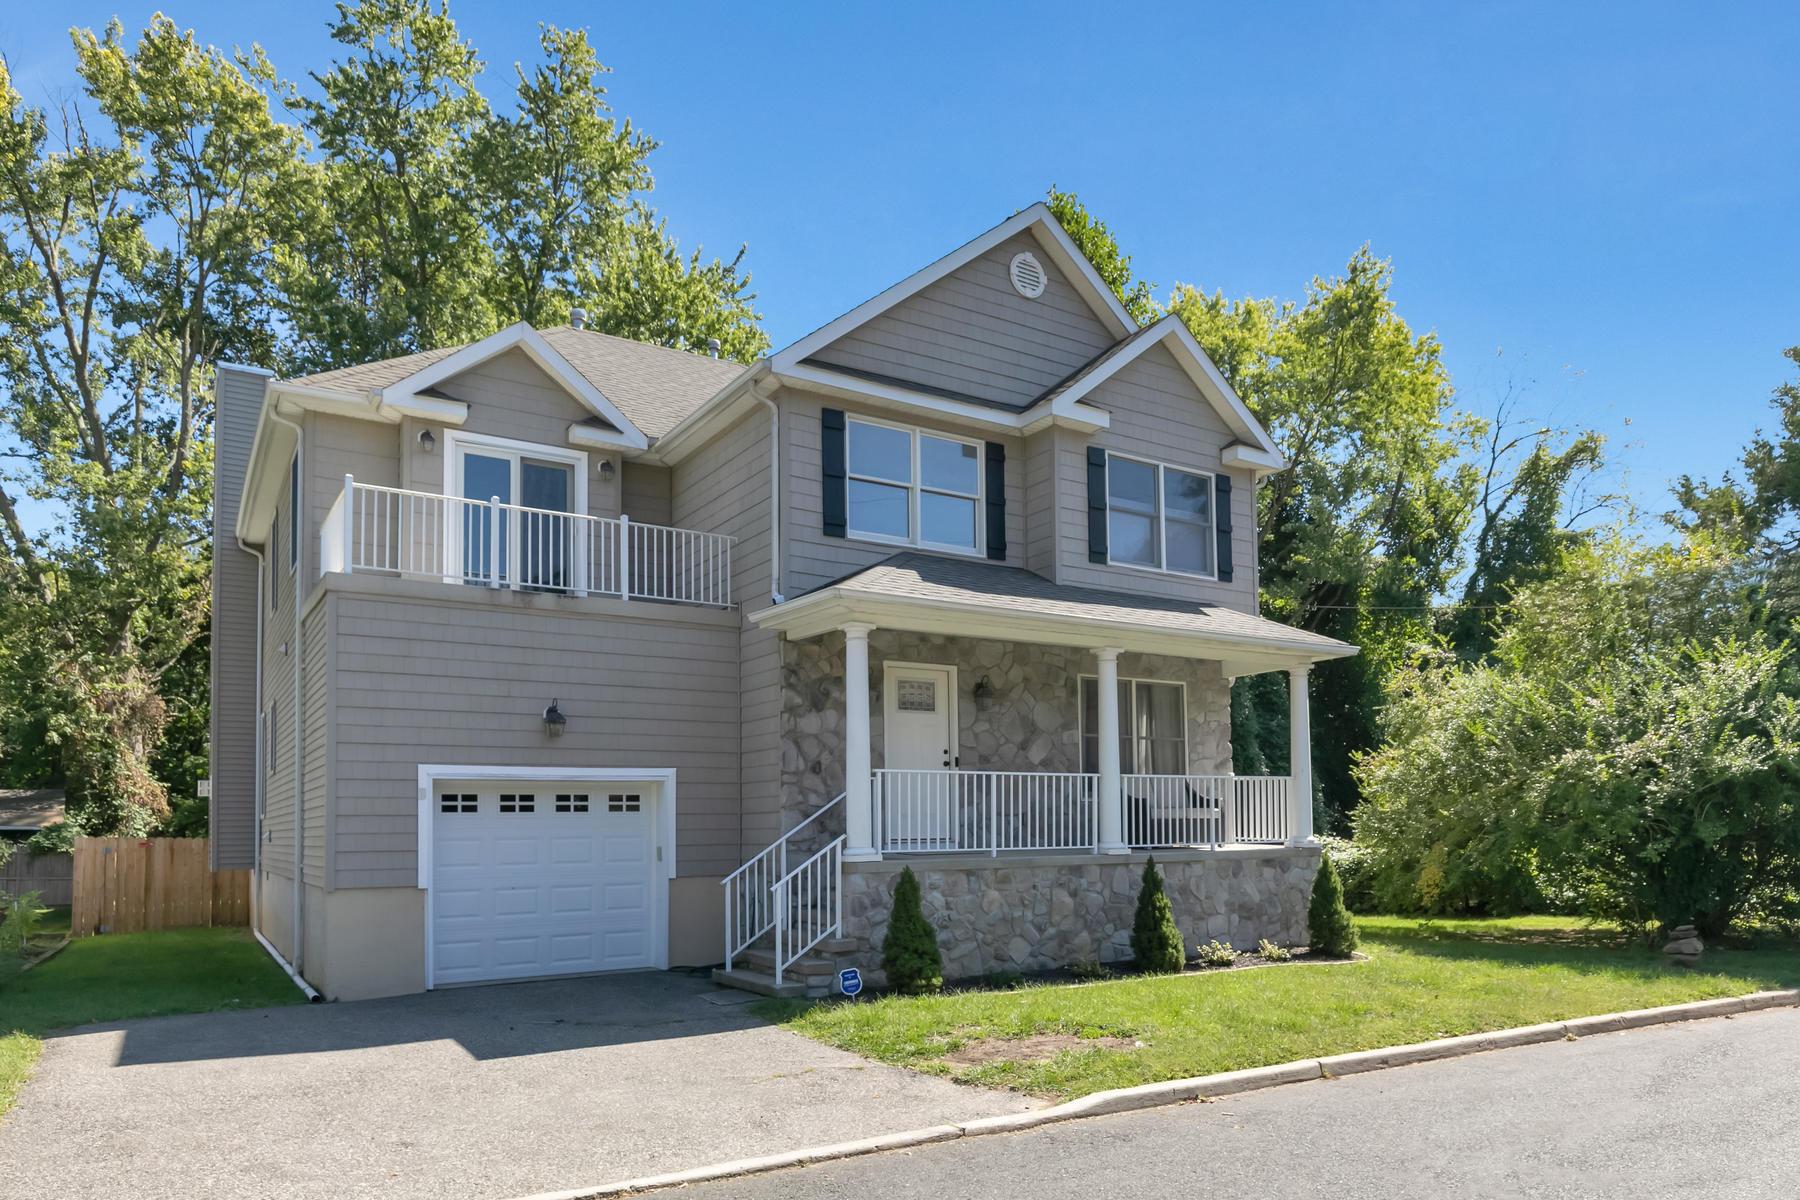 Single Family Homes για την Πώληση στο Middletown, Νιου Τζερσεϋ 07748 Ηνωμένες Πολιτείες